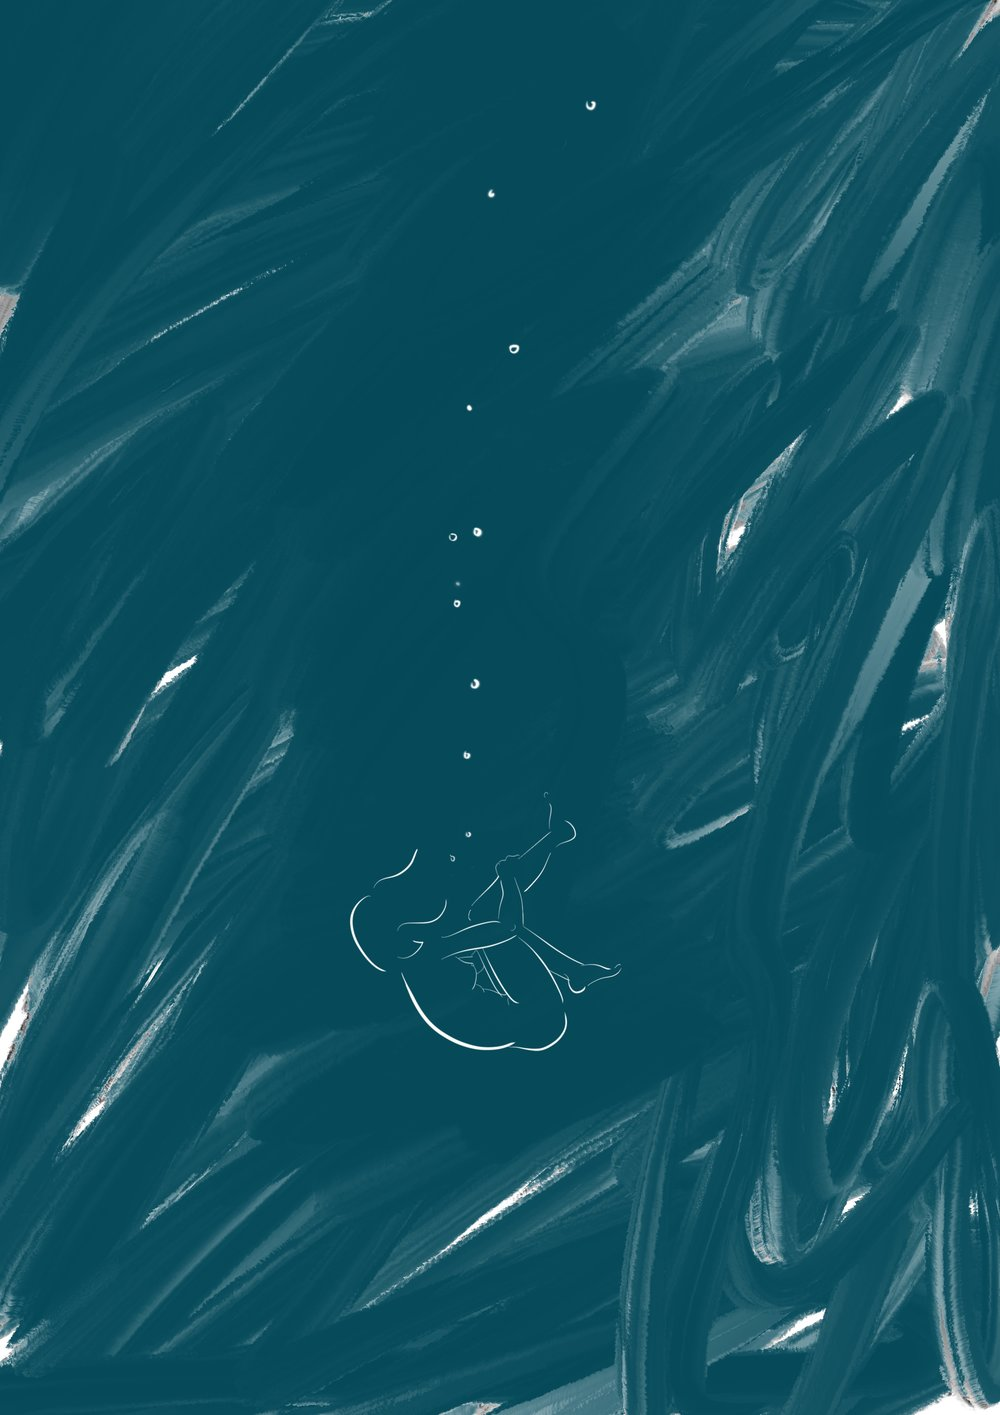 Inktober_4__Underwater.jpg